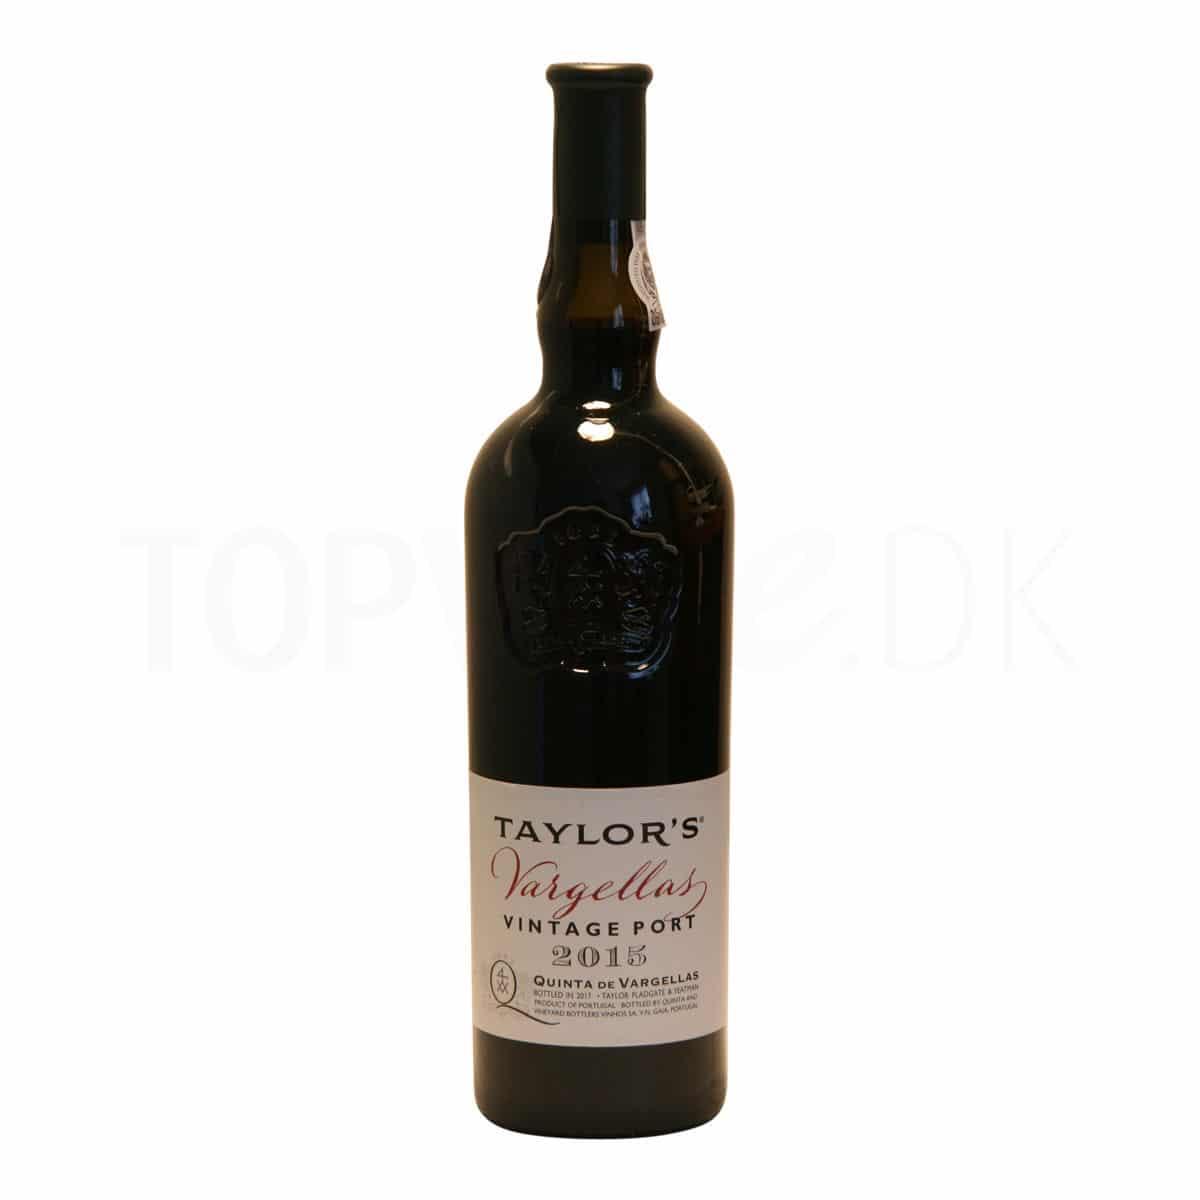 Topvine Taylors Vargellas Vintage 2015